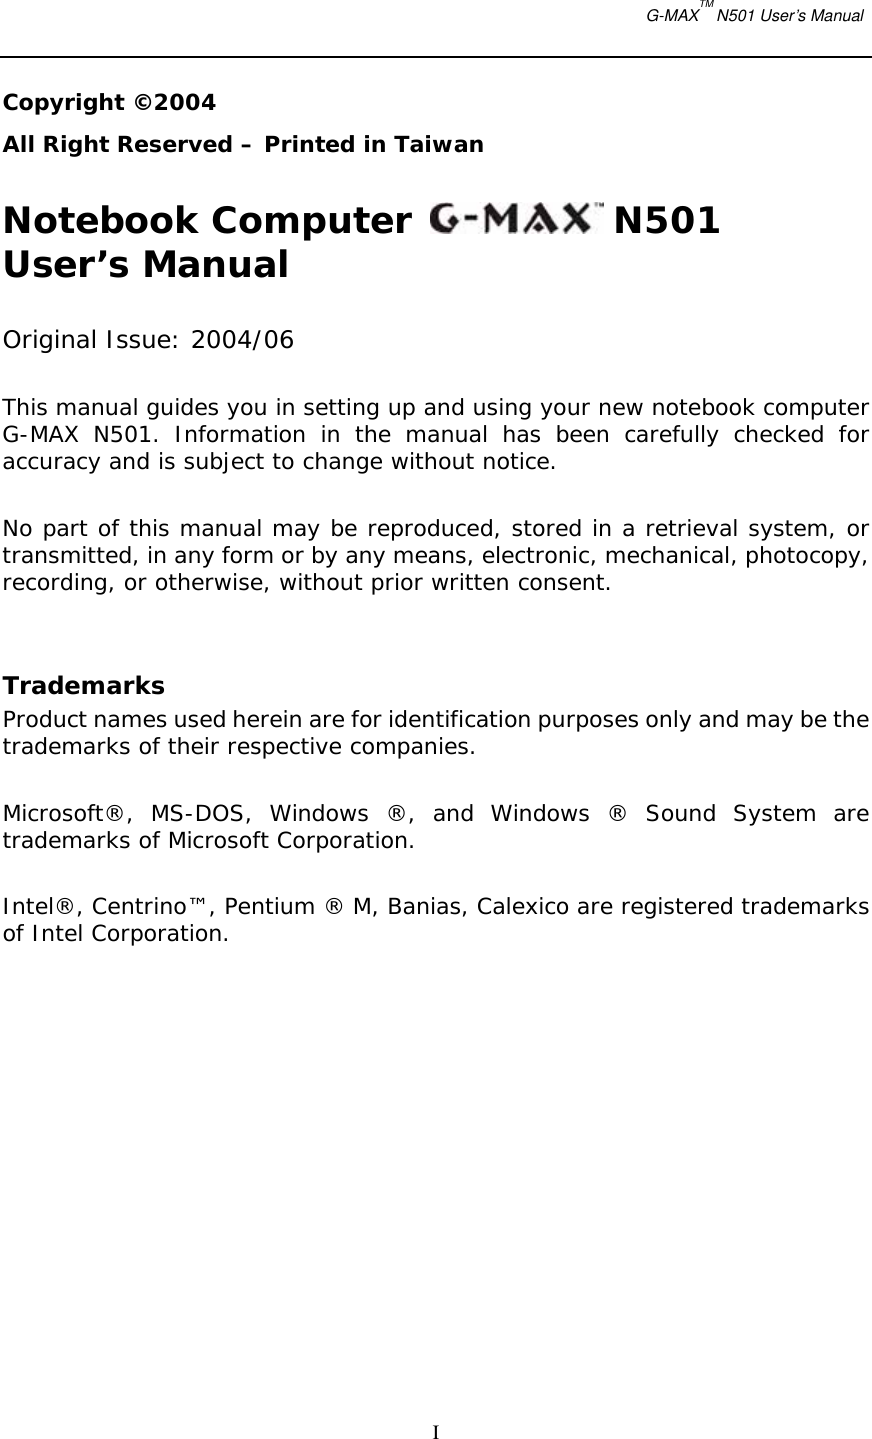 Gigabyte G Max N501 Users Manual